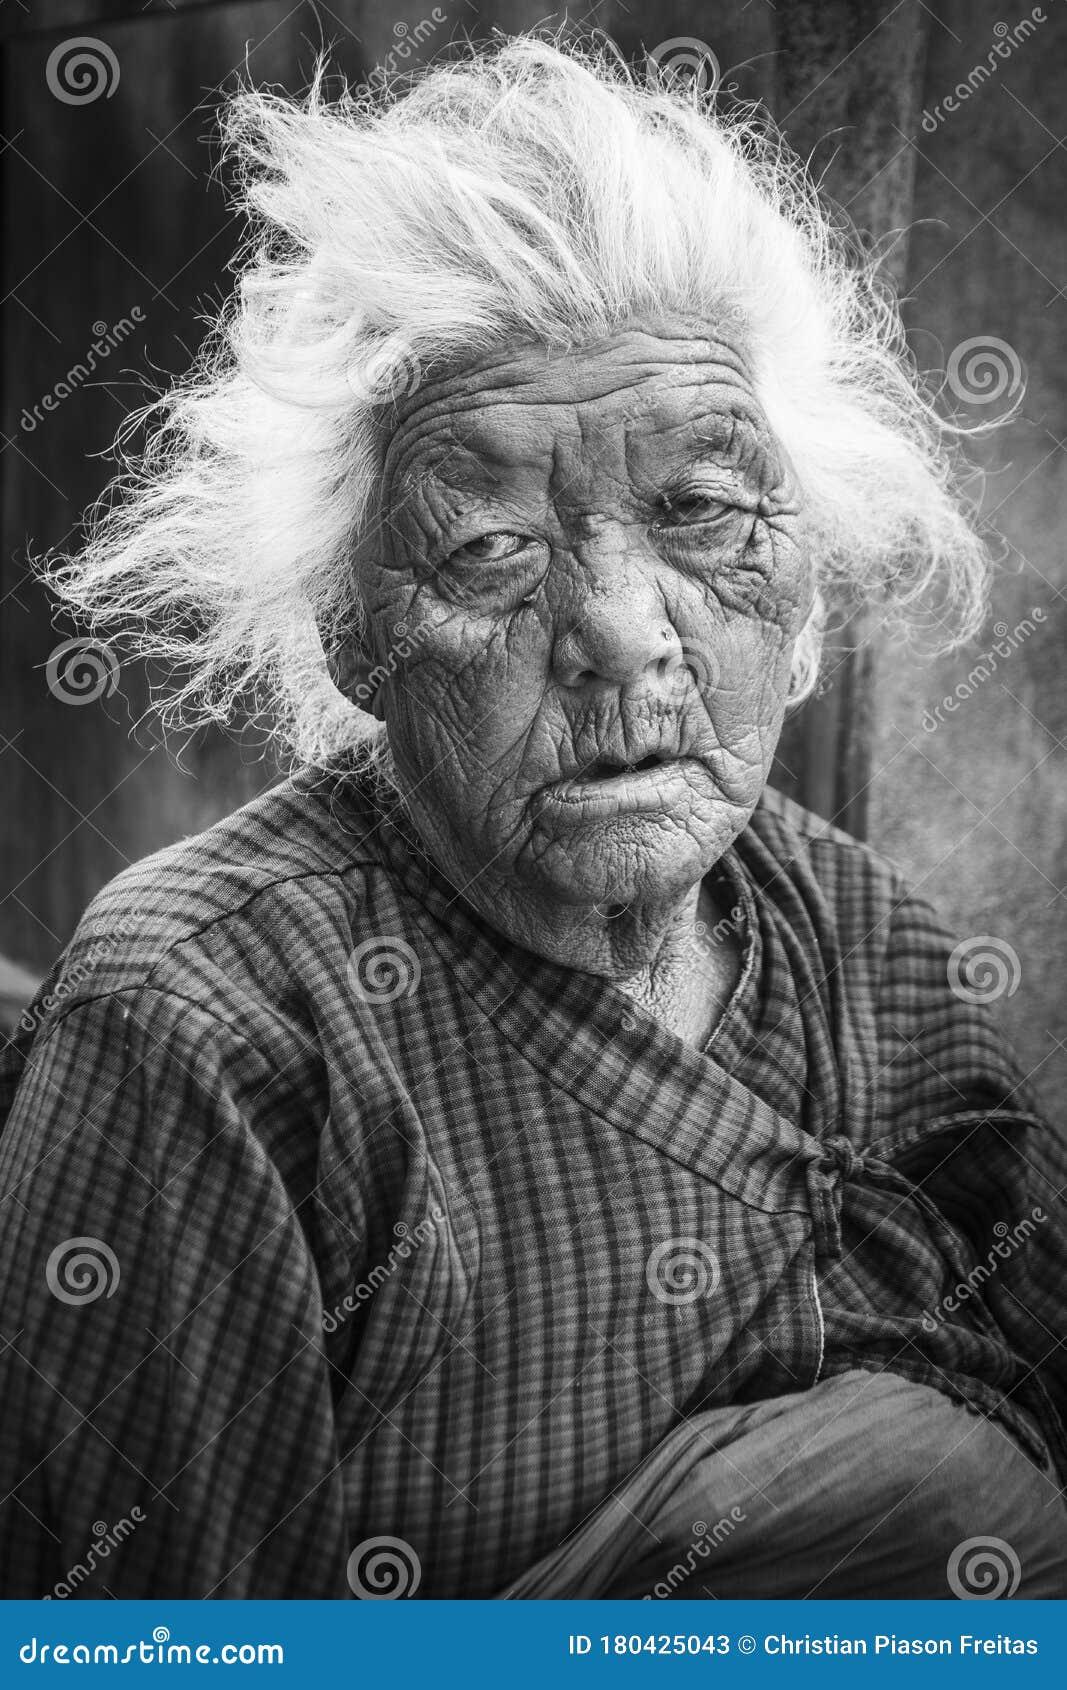 10,1085 Black Homeless Woman Photos   Free & Royalty Free Stock ...